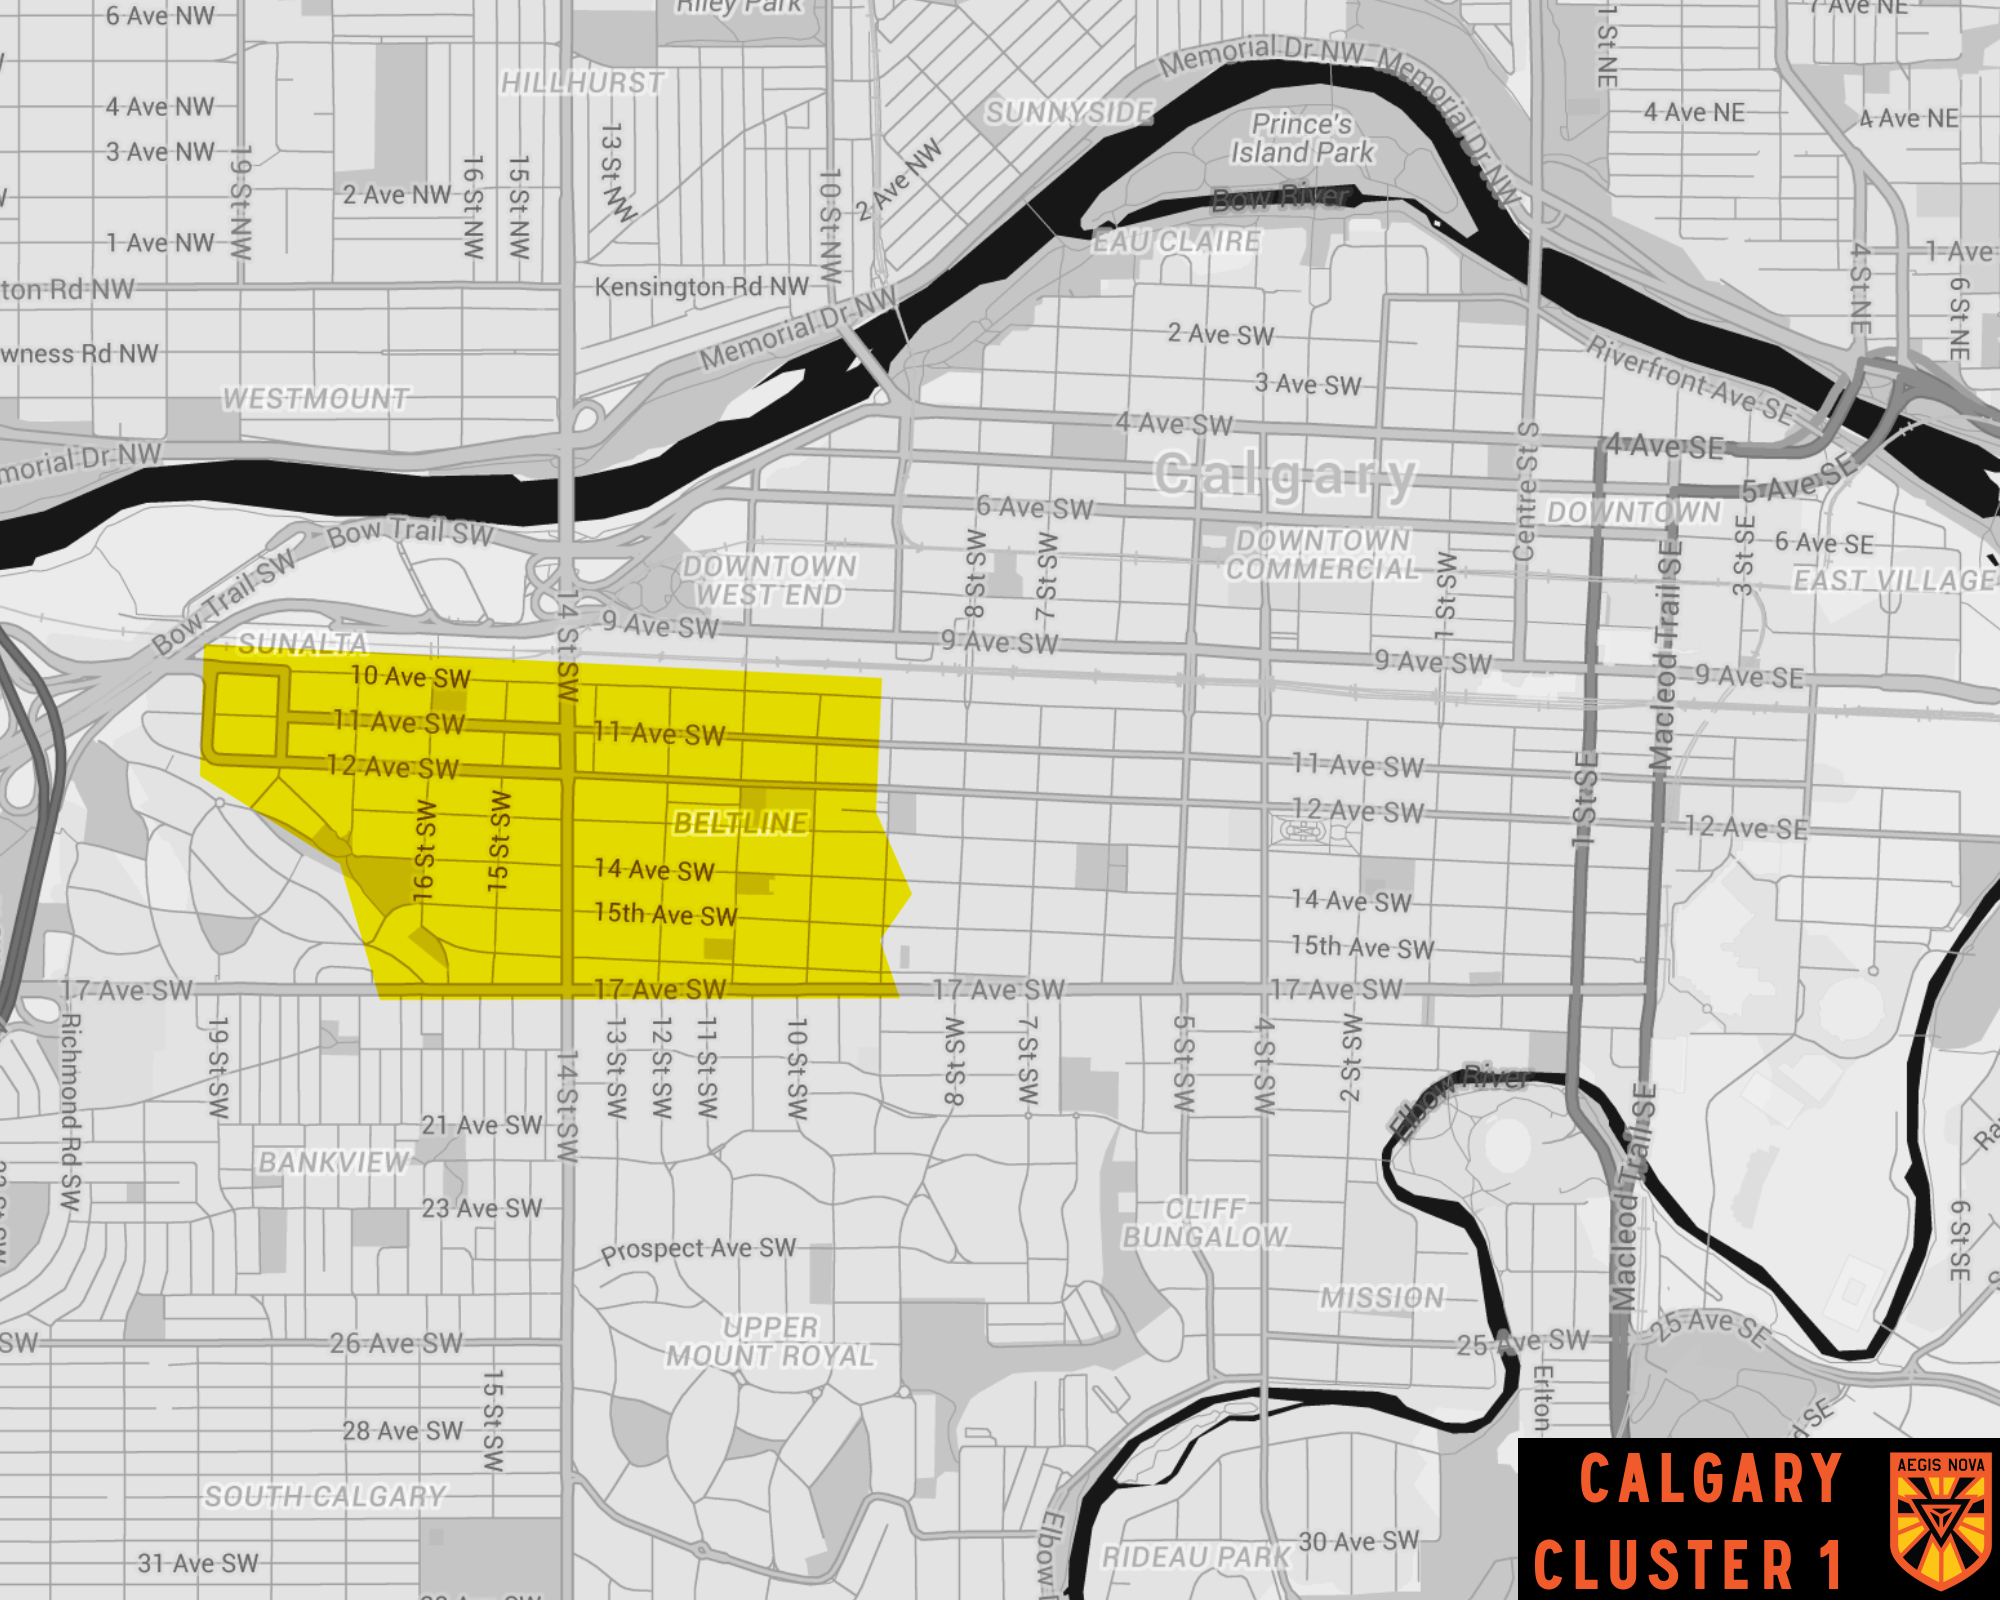 CalgaryCluster1.png